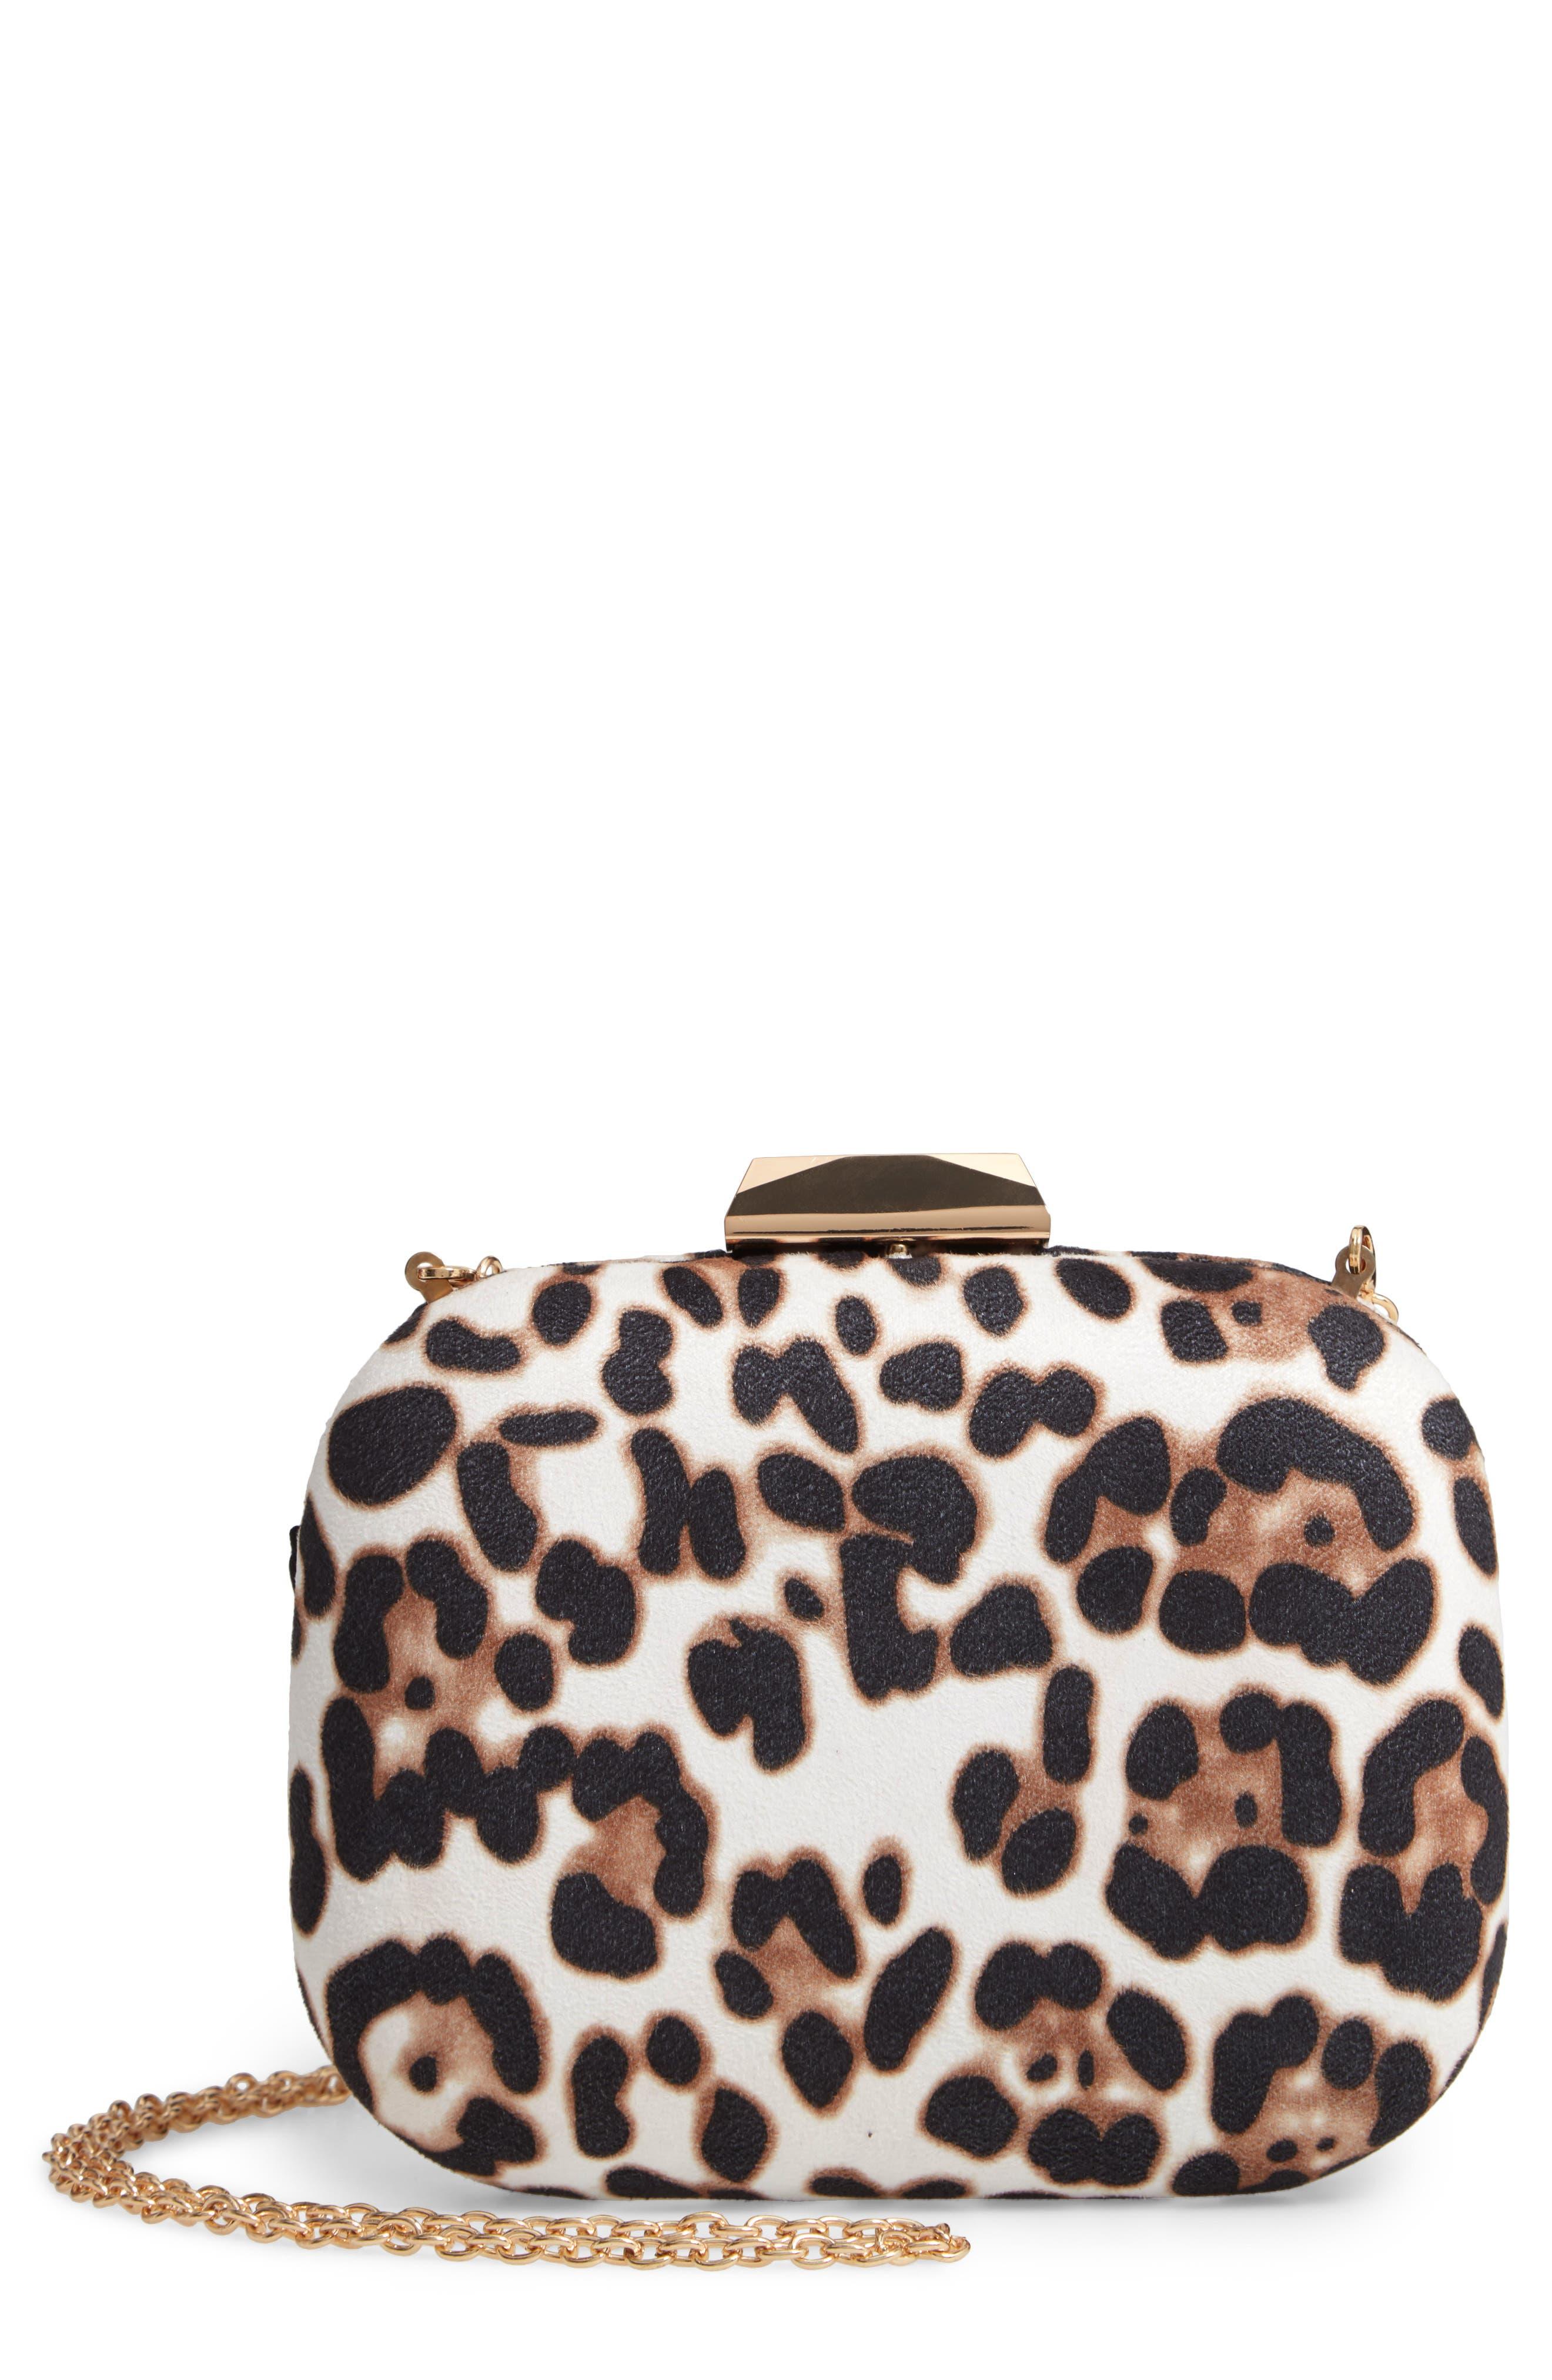 MALI + LILI Mini Katie Leopard Print Clutch, Main, color, WHITE